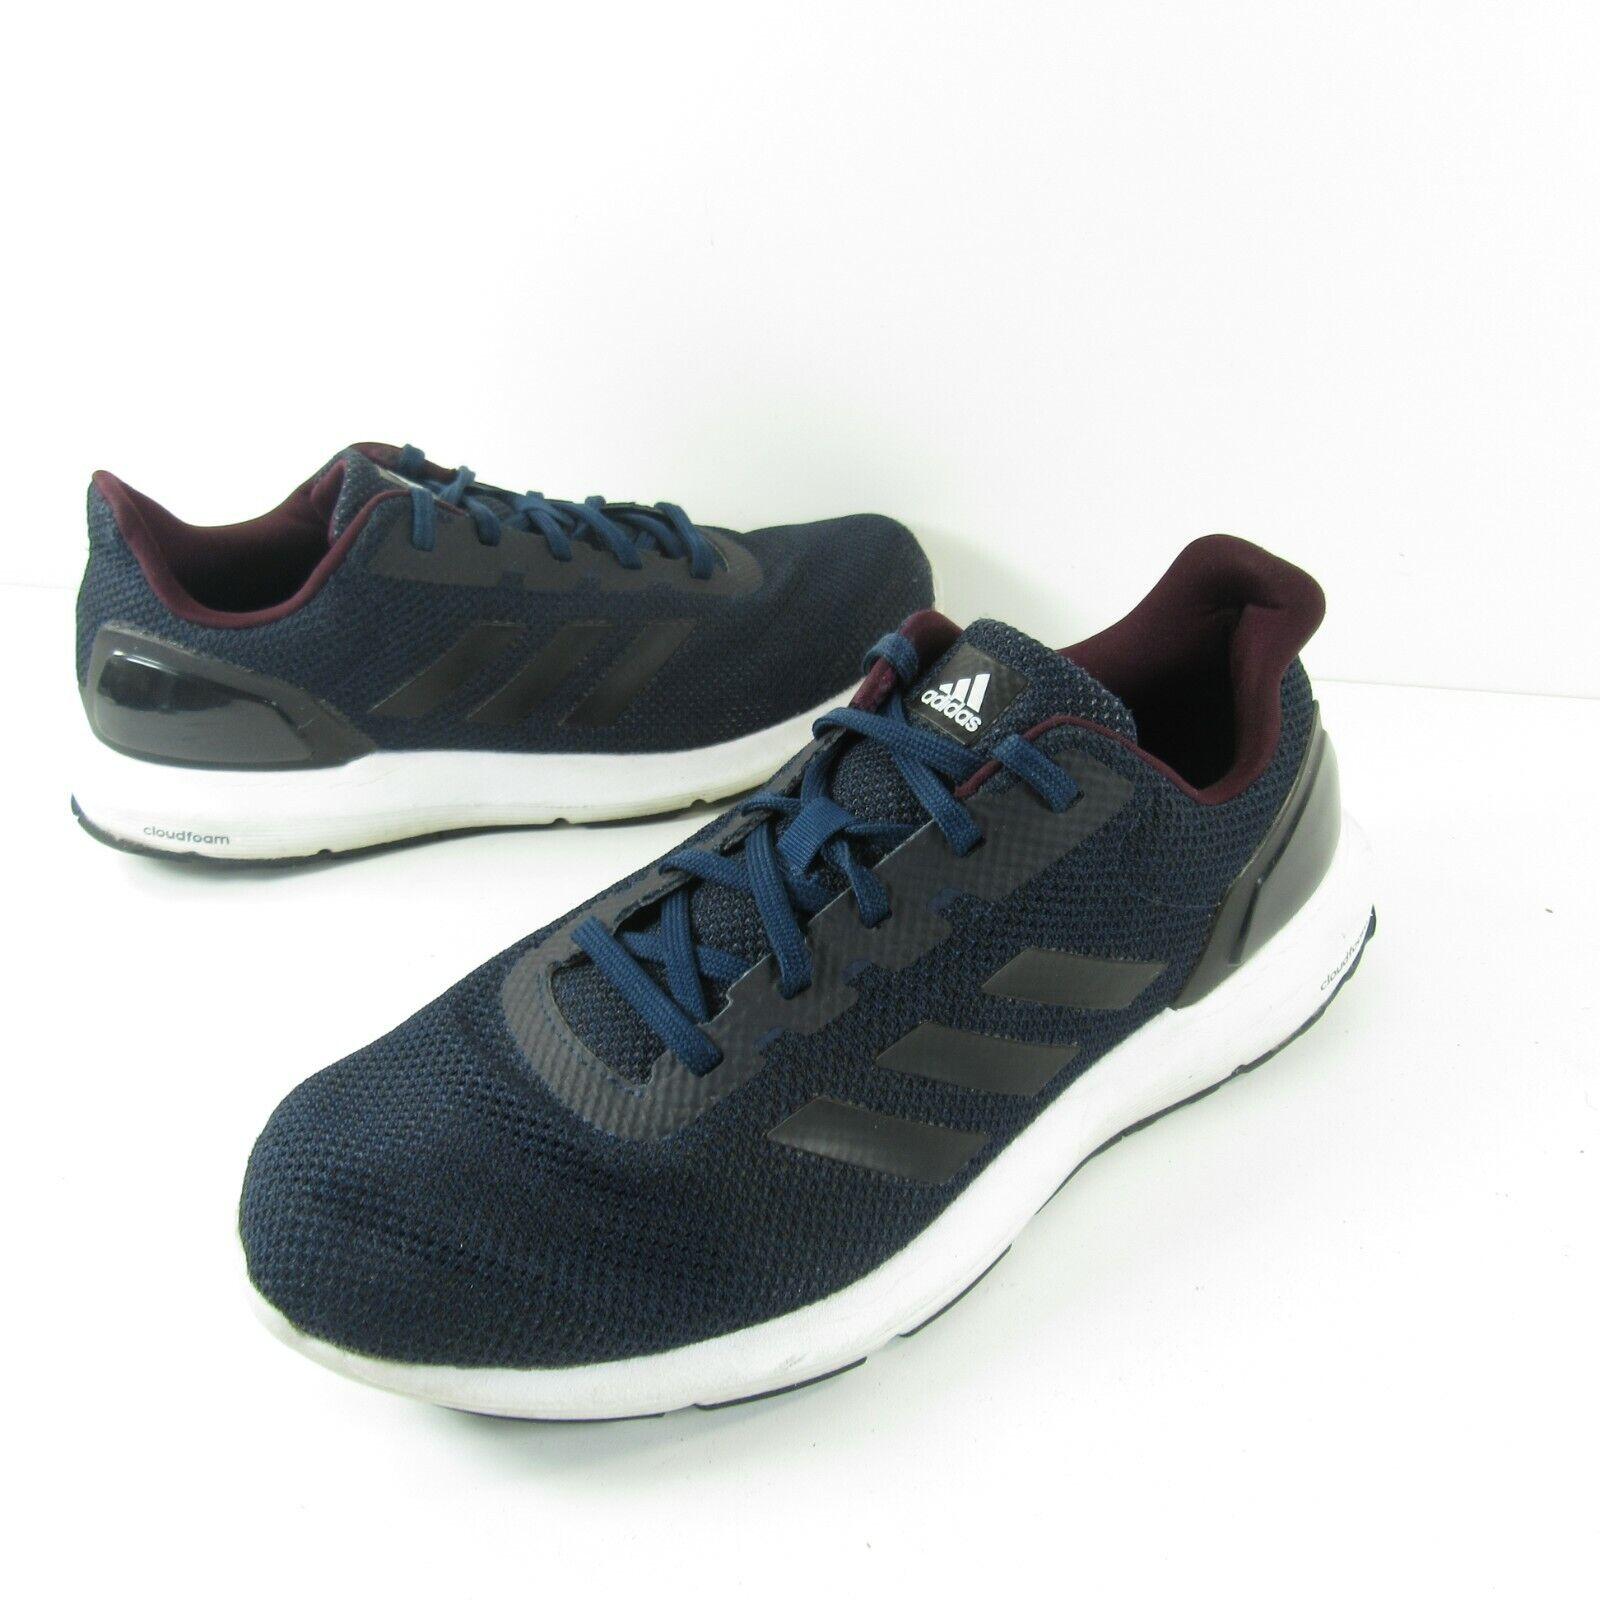 Adidas Cloudfoam Ultimate M CG5800